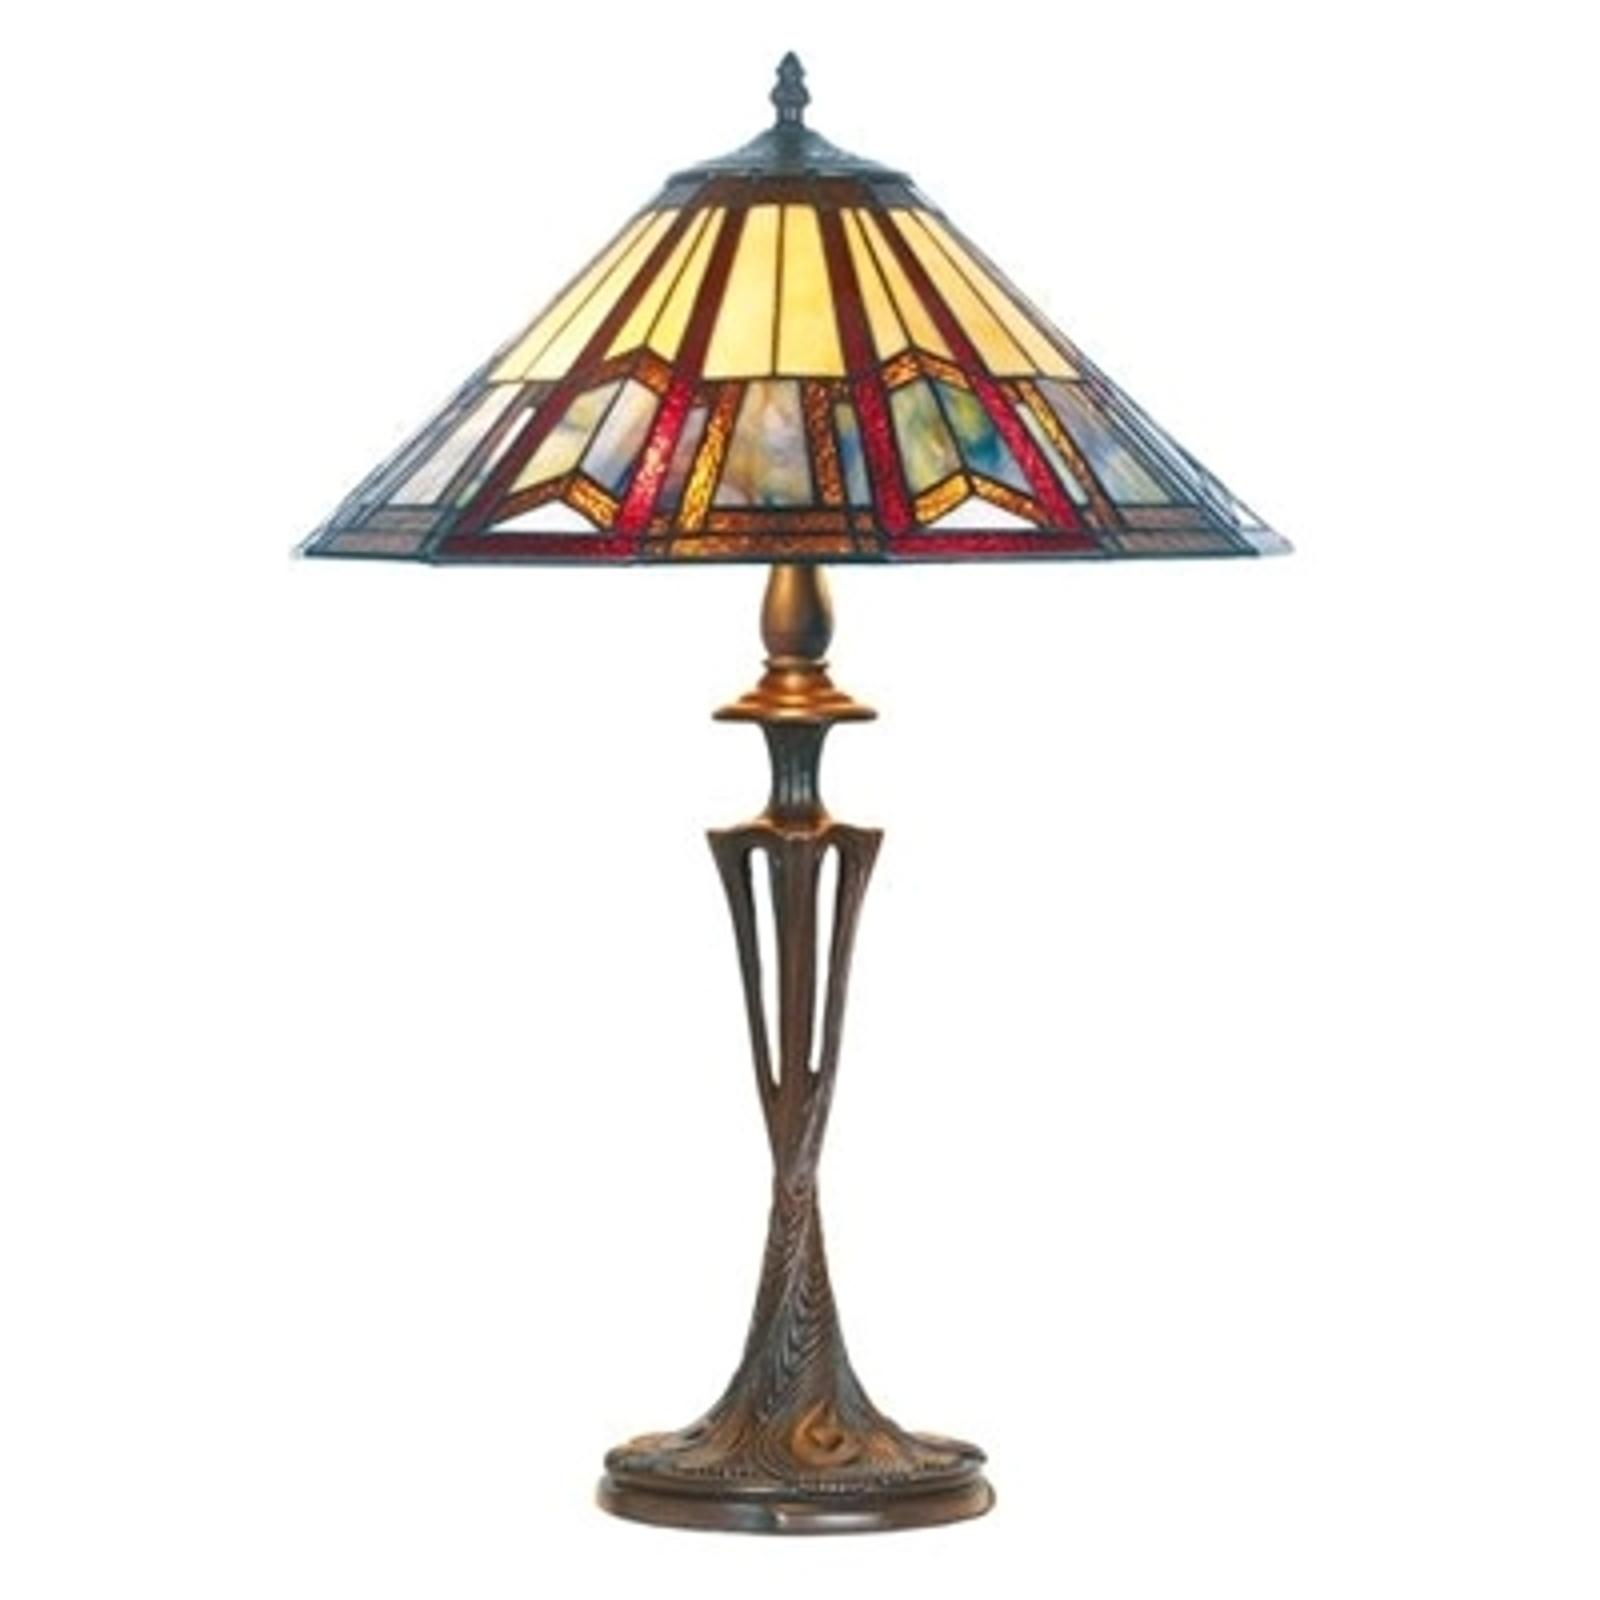 LILLIE elegante tafellamp in Tiffany-stijl